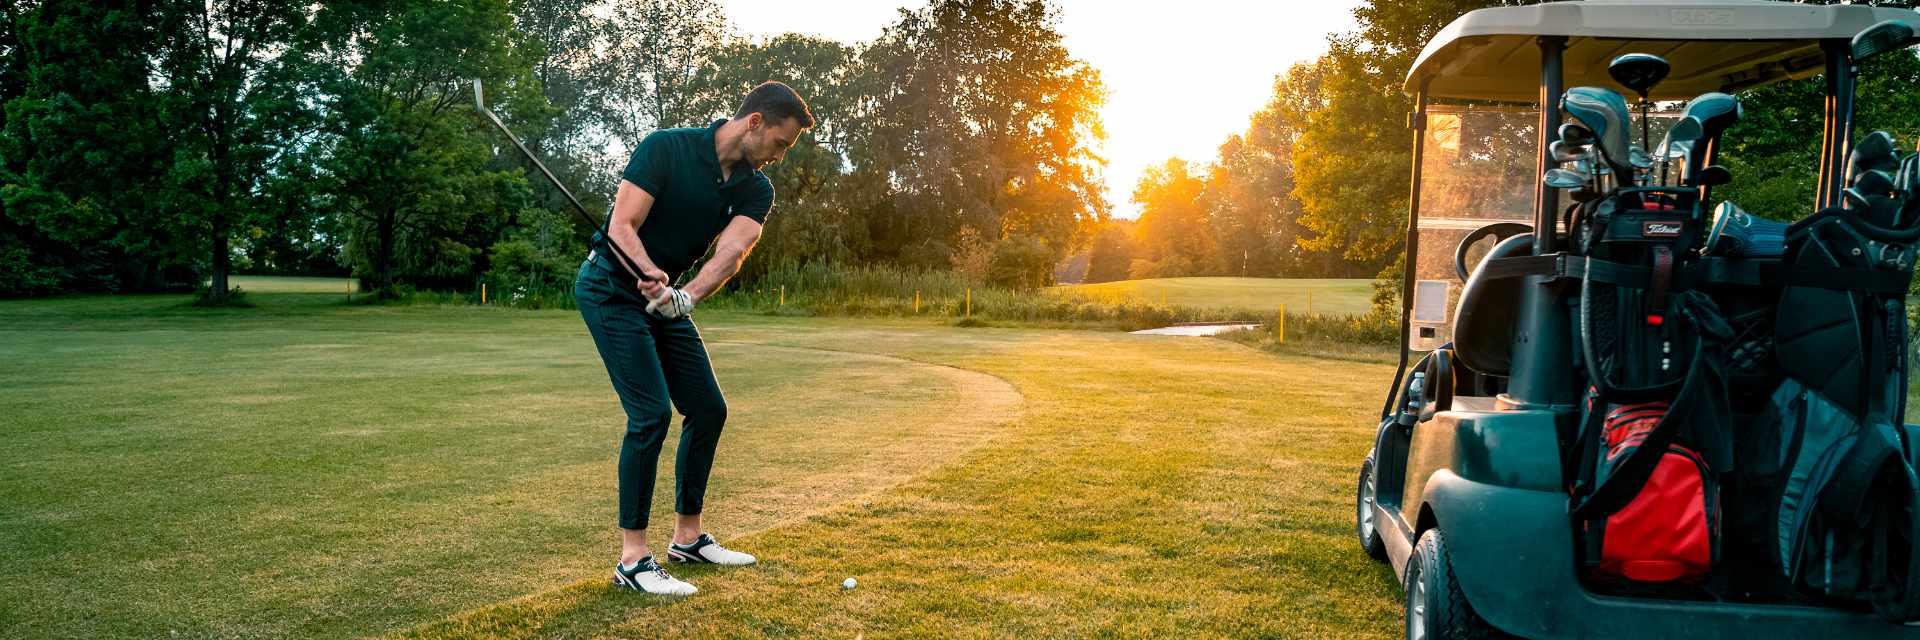 Golf_25_05_2020_Bearbeitet_77Slider2